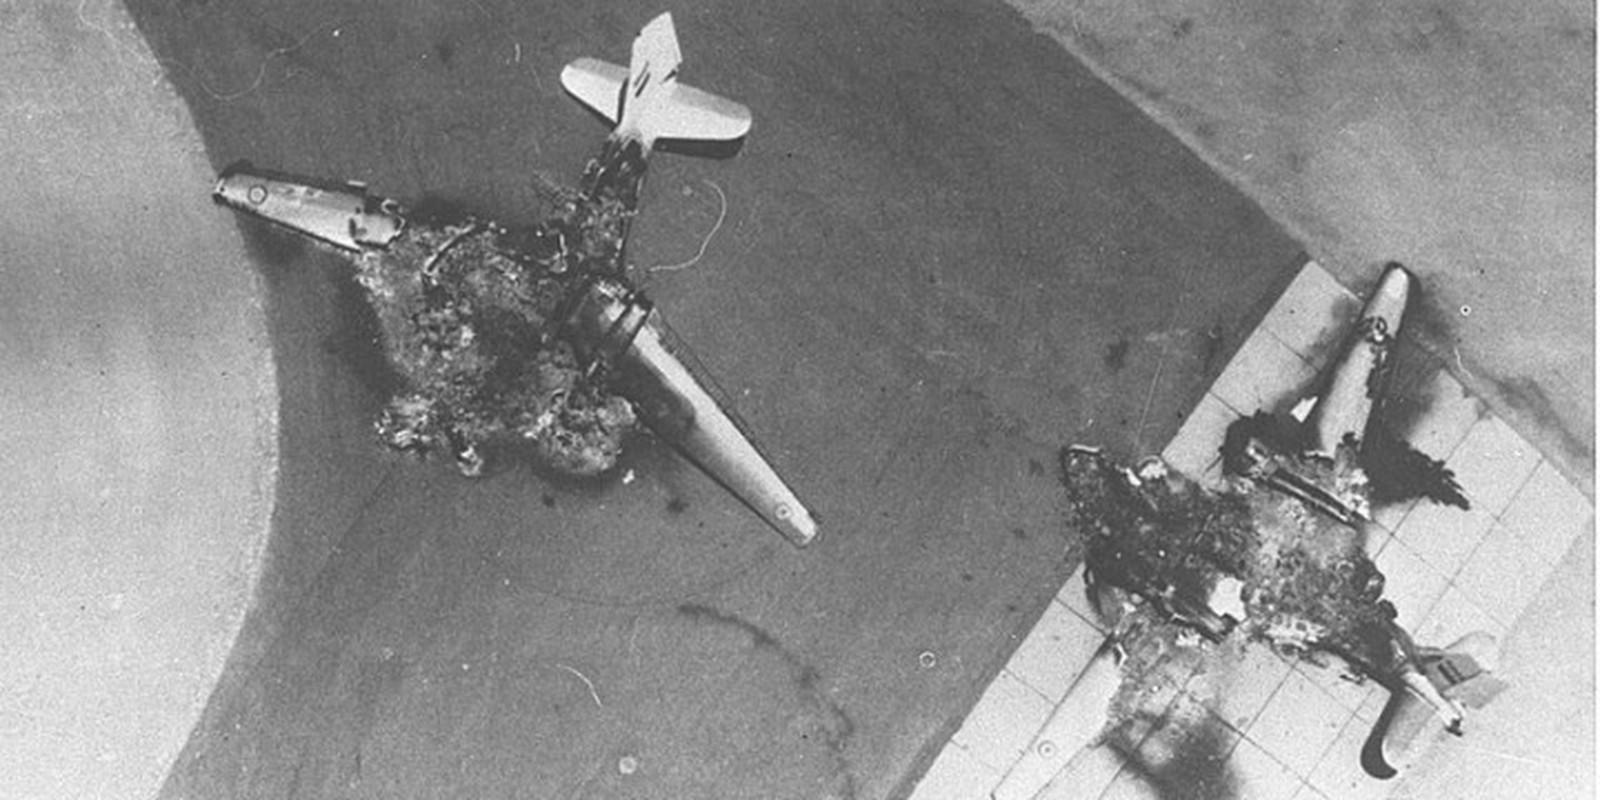 Tai sao cuoc chien nam 1967 cua Israel la loi canh bao Dai Loan-Hinh-2